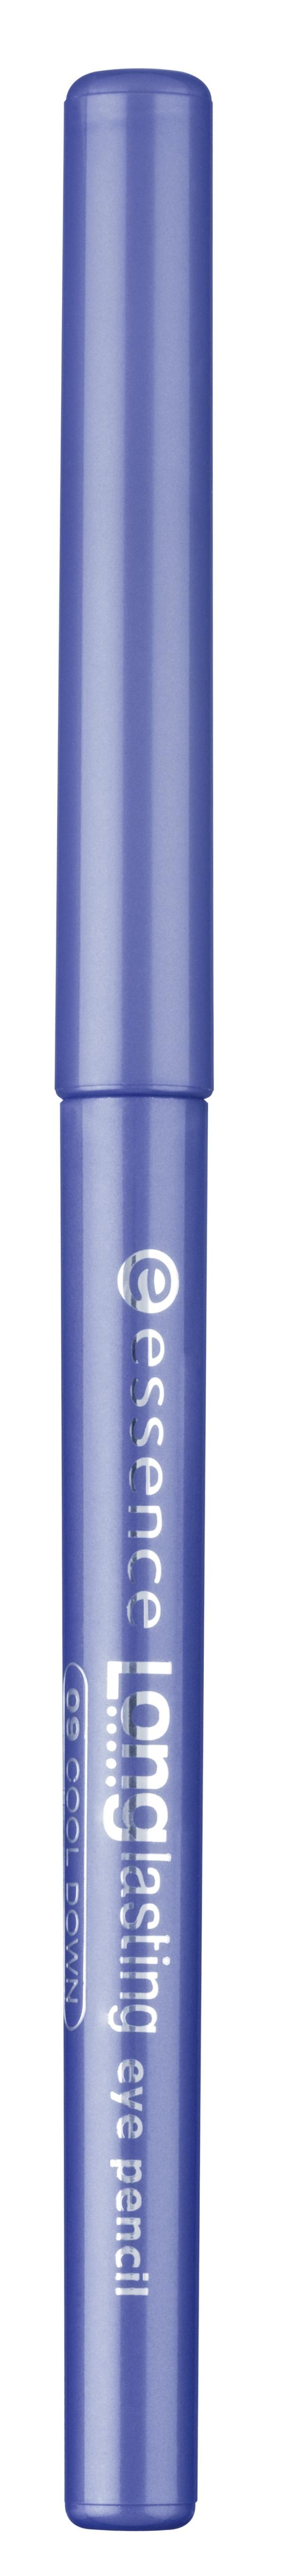 essence Карандаш для глаз Long lasting синий т.09, 0,28гр